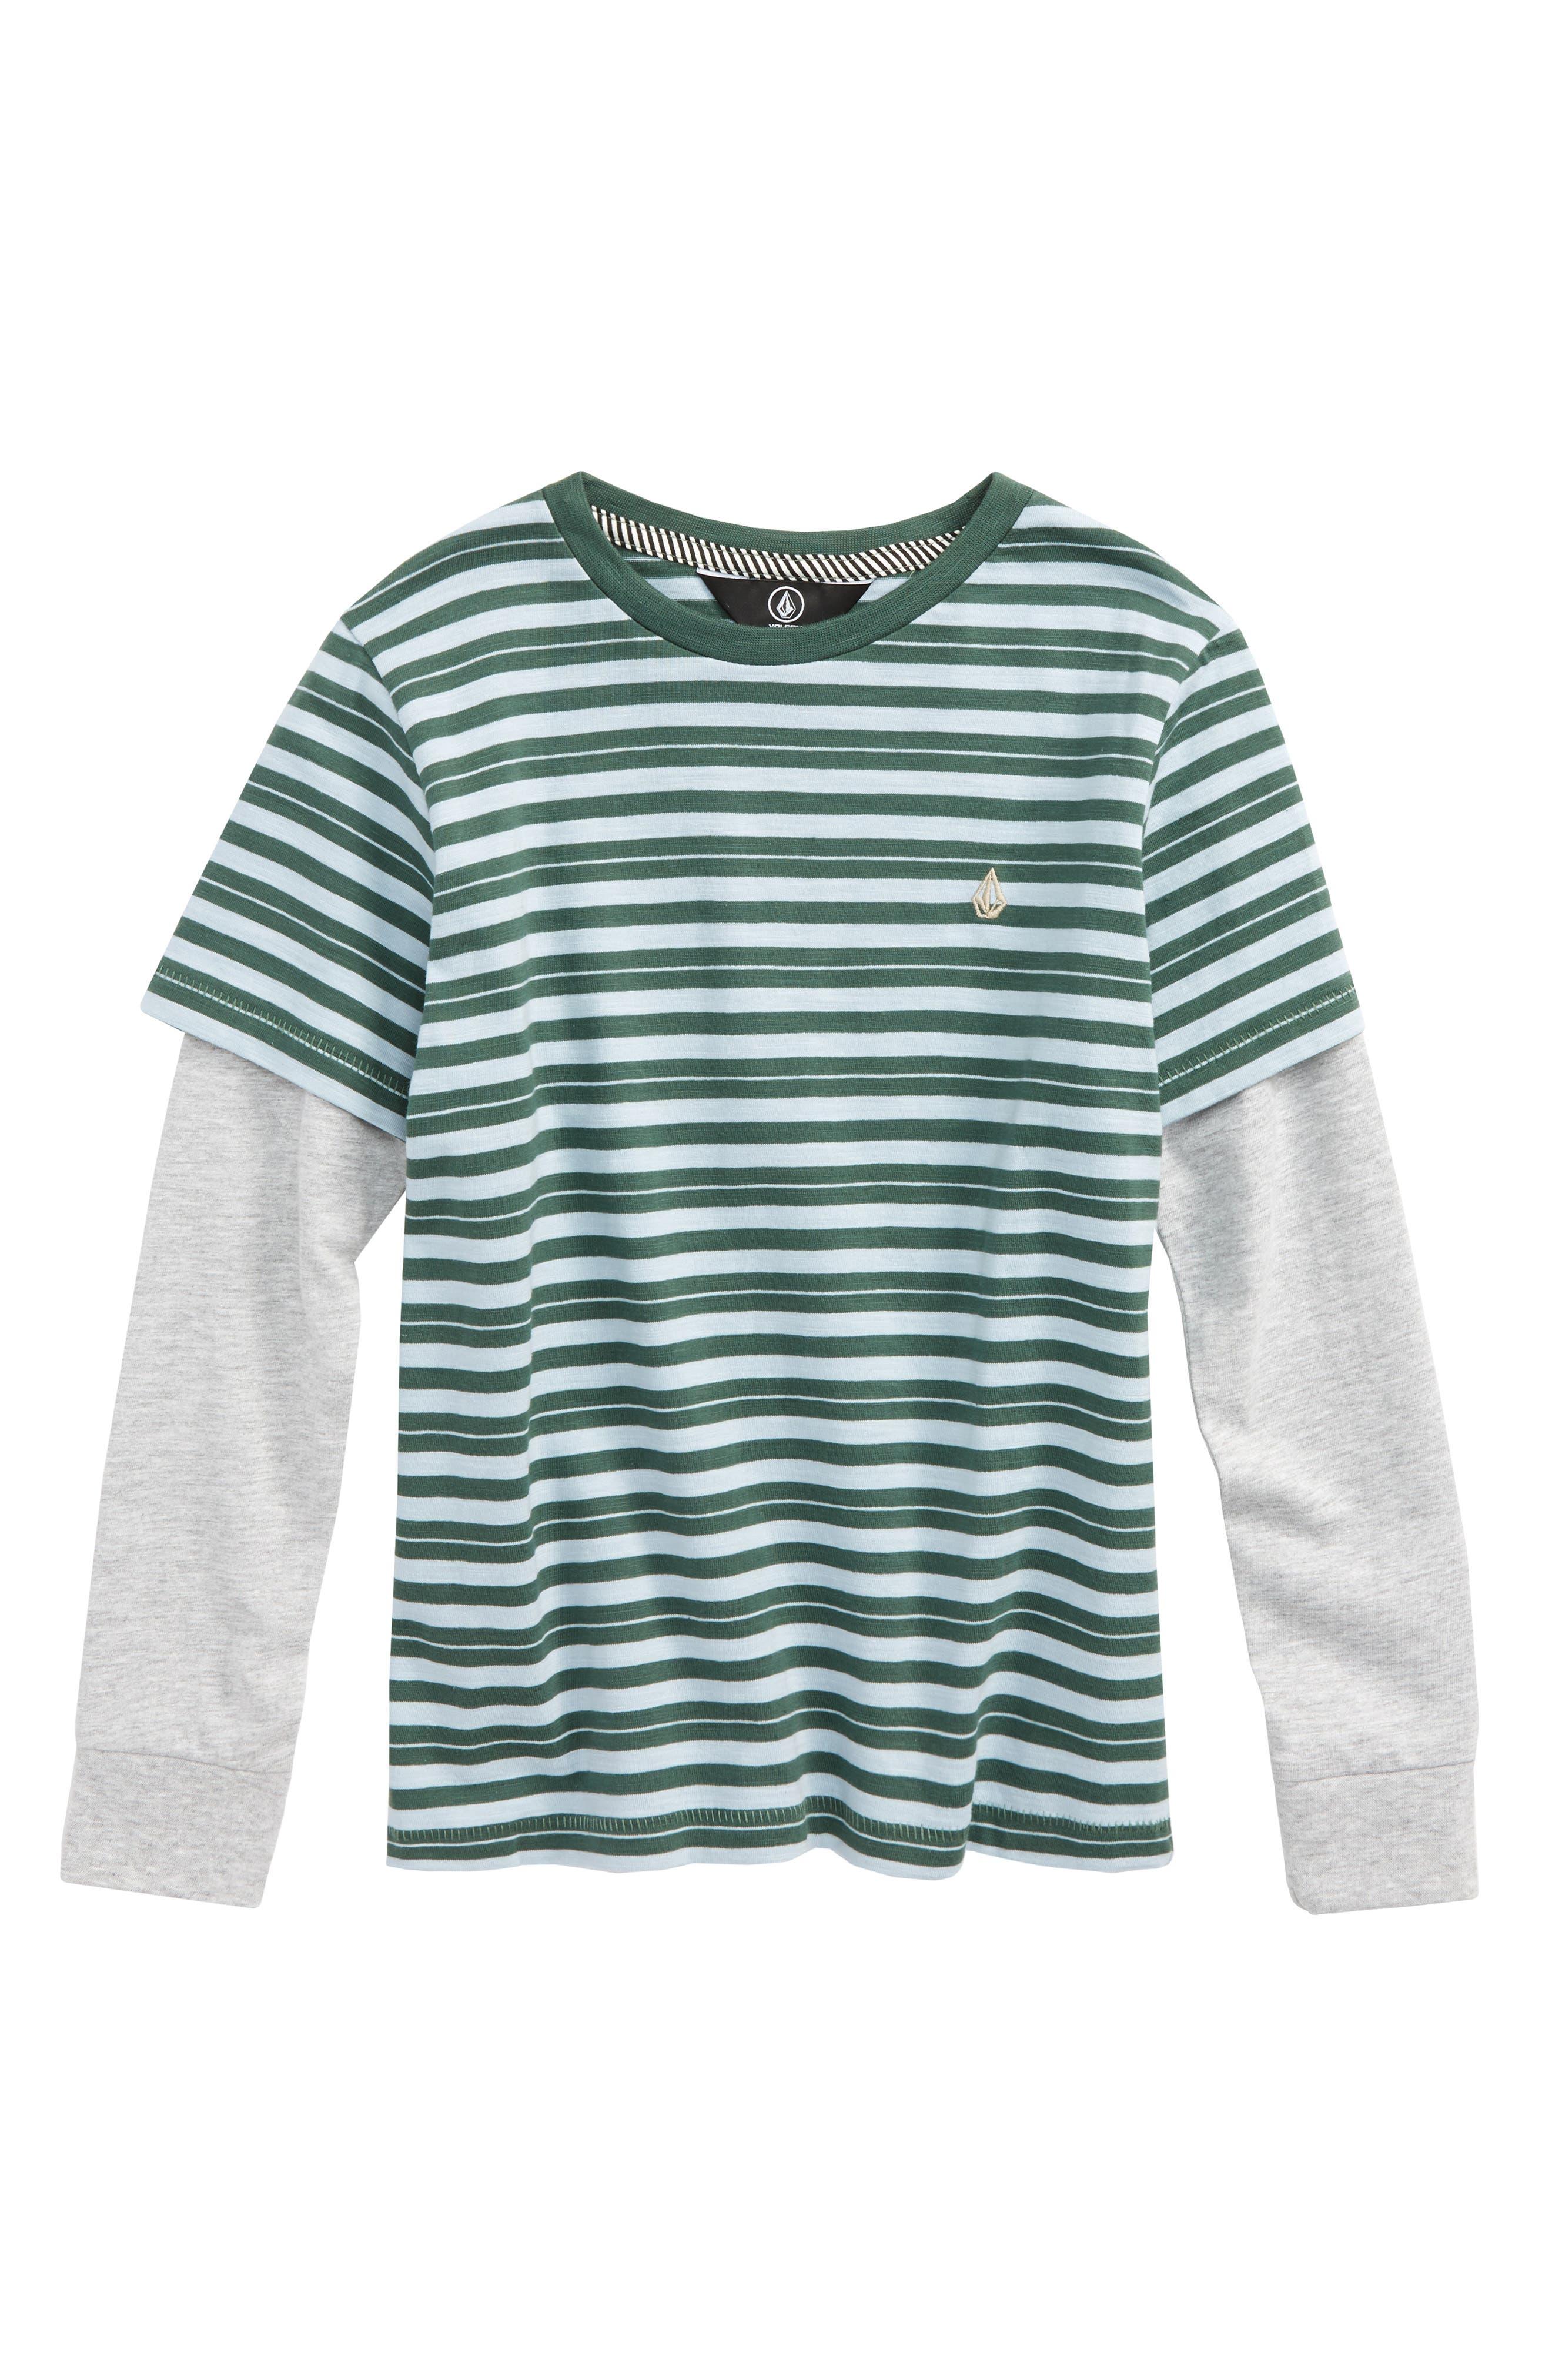 Volcom Impact Twofer Layered T-Shirt (Toddler Boys & Little Boys)